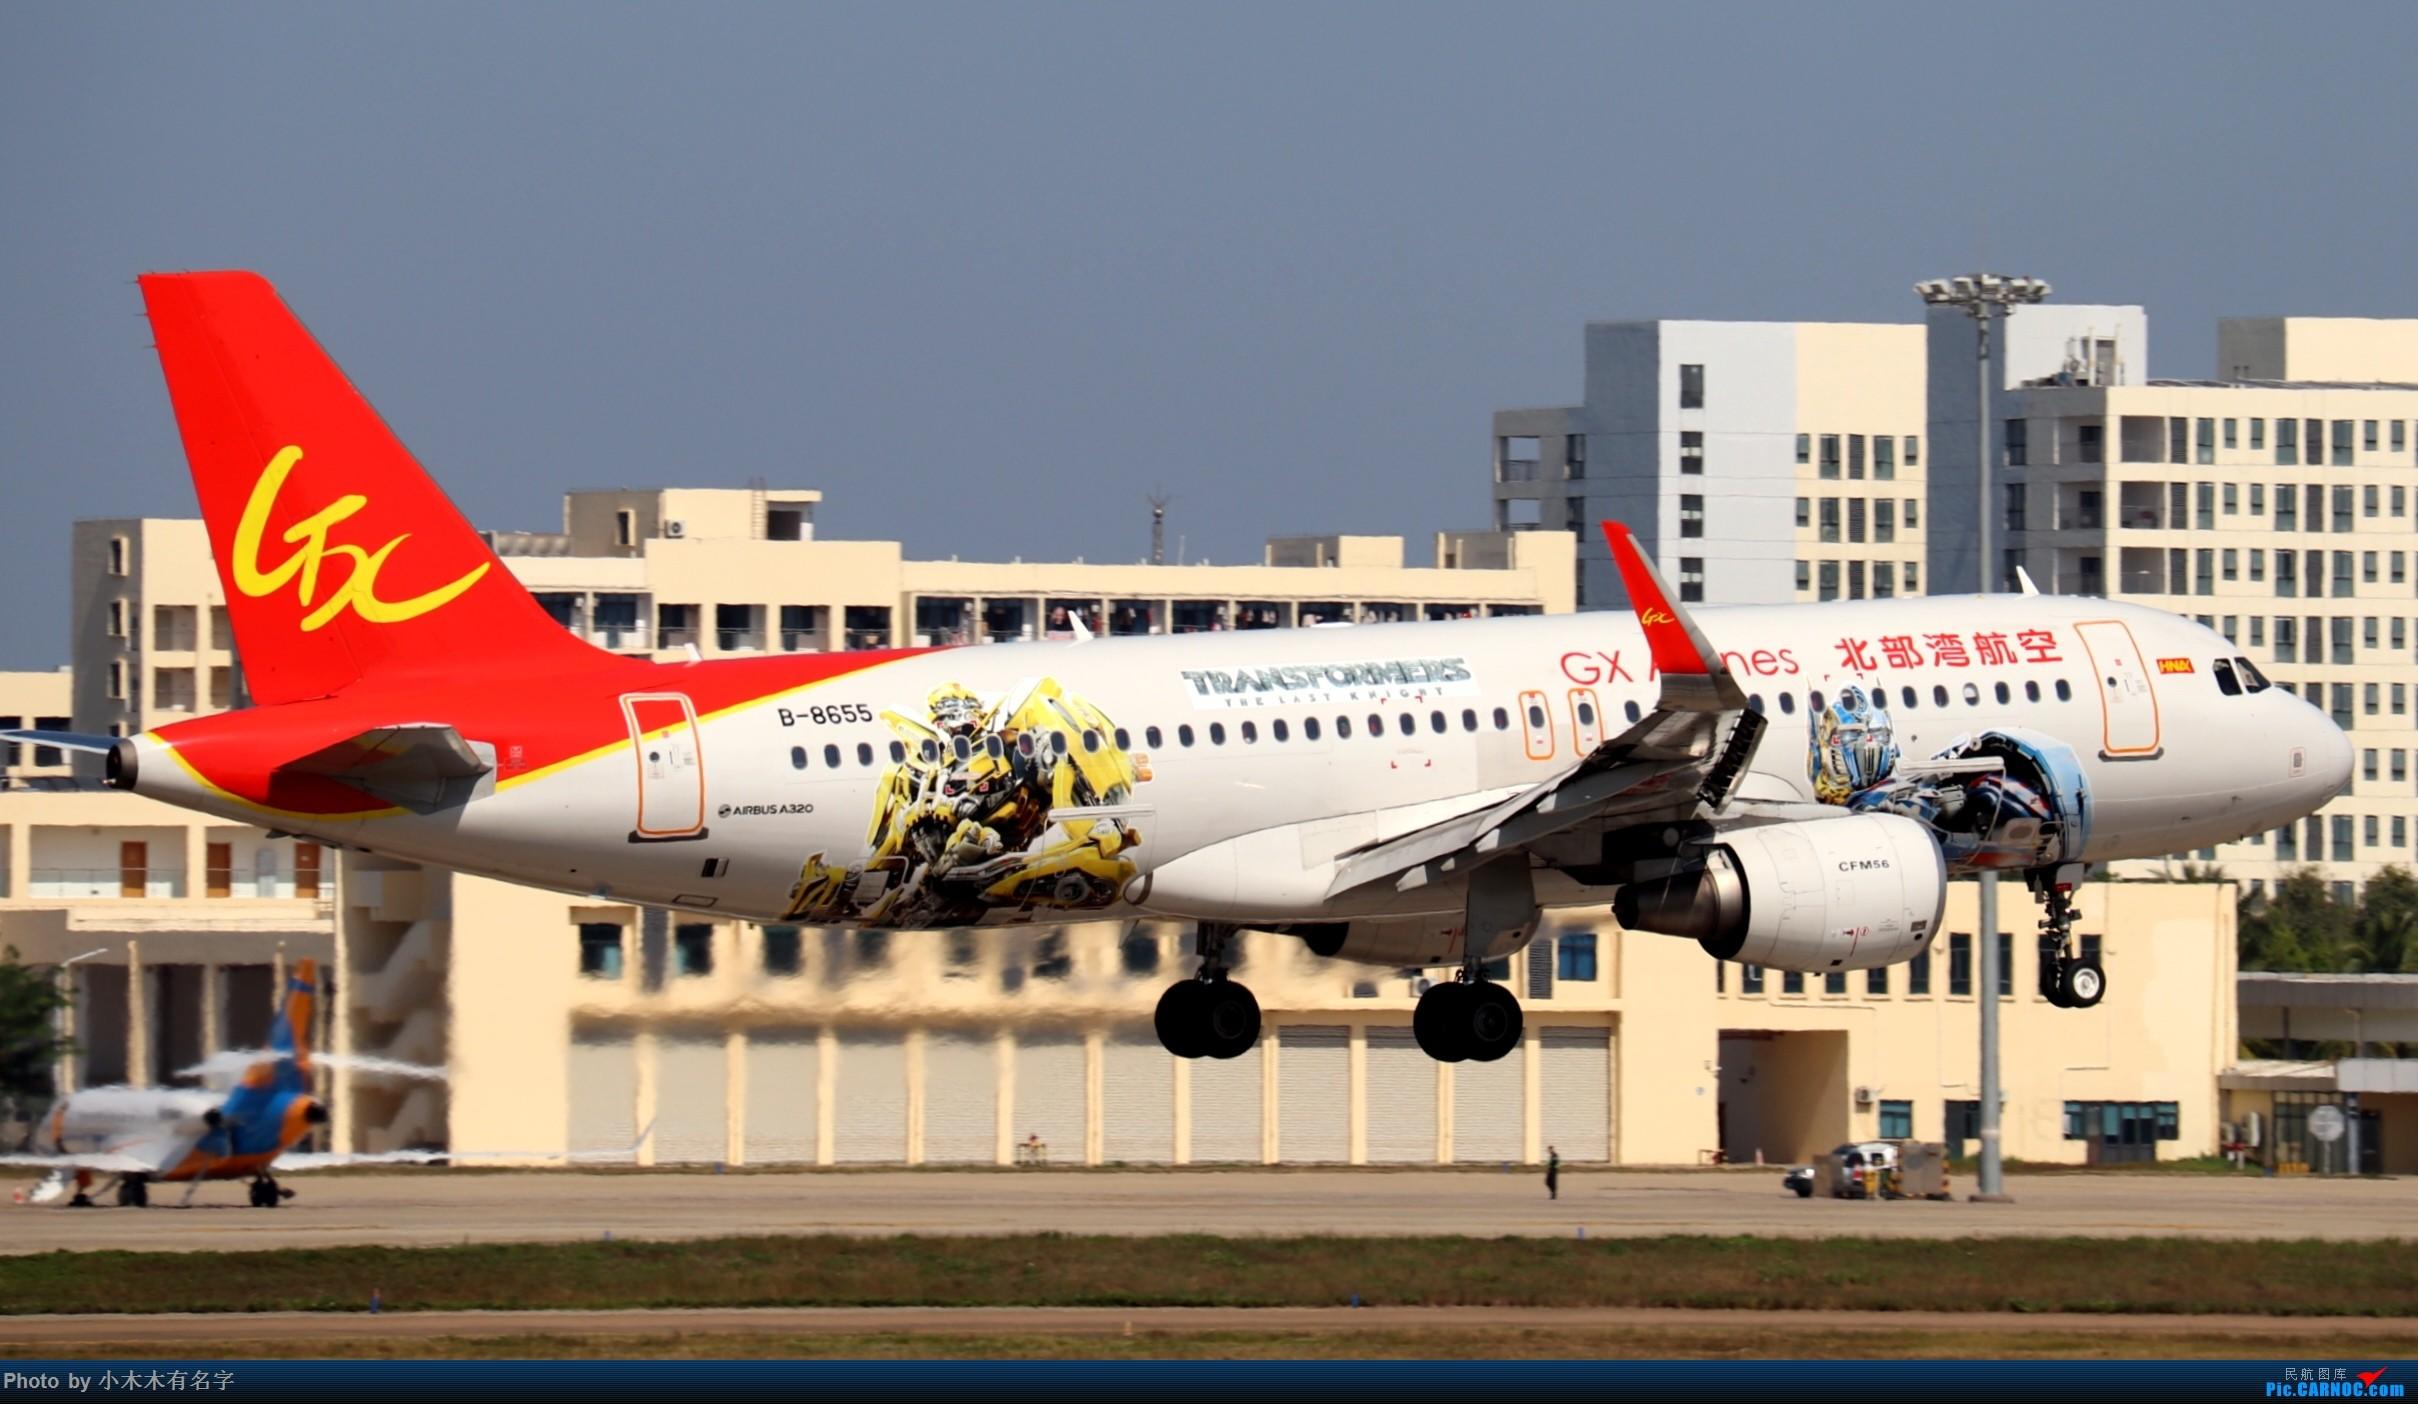 Re:[原创]2019冬天的海口美兰 AIRBUS A320-200 B-8655 中国海口美兰国际机场